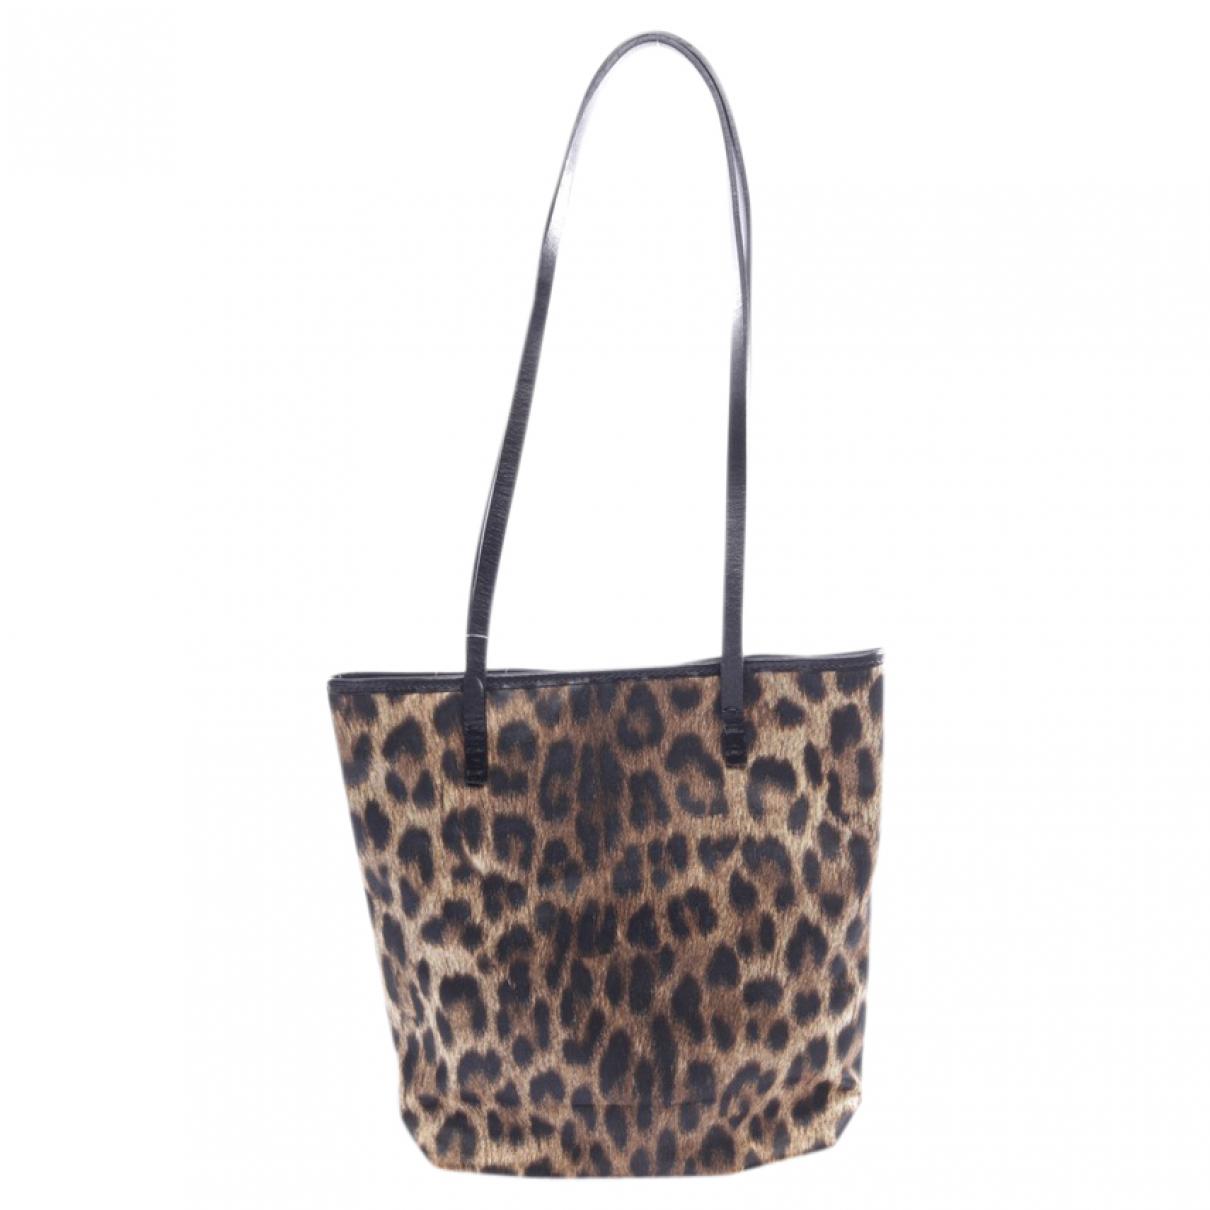 Moschino N Brown Cloth handbag for Women N